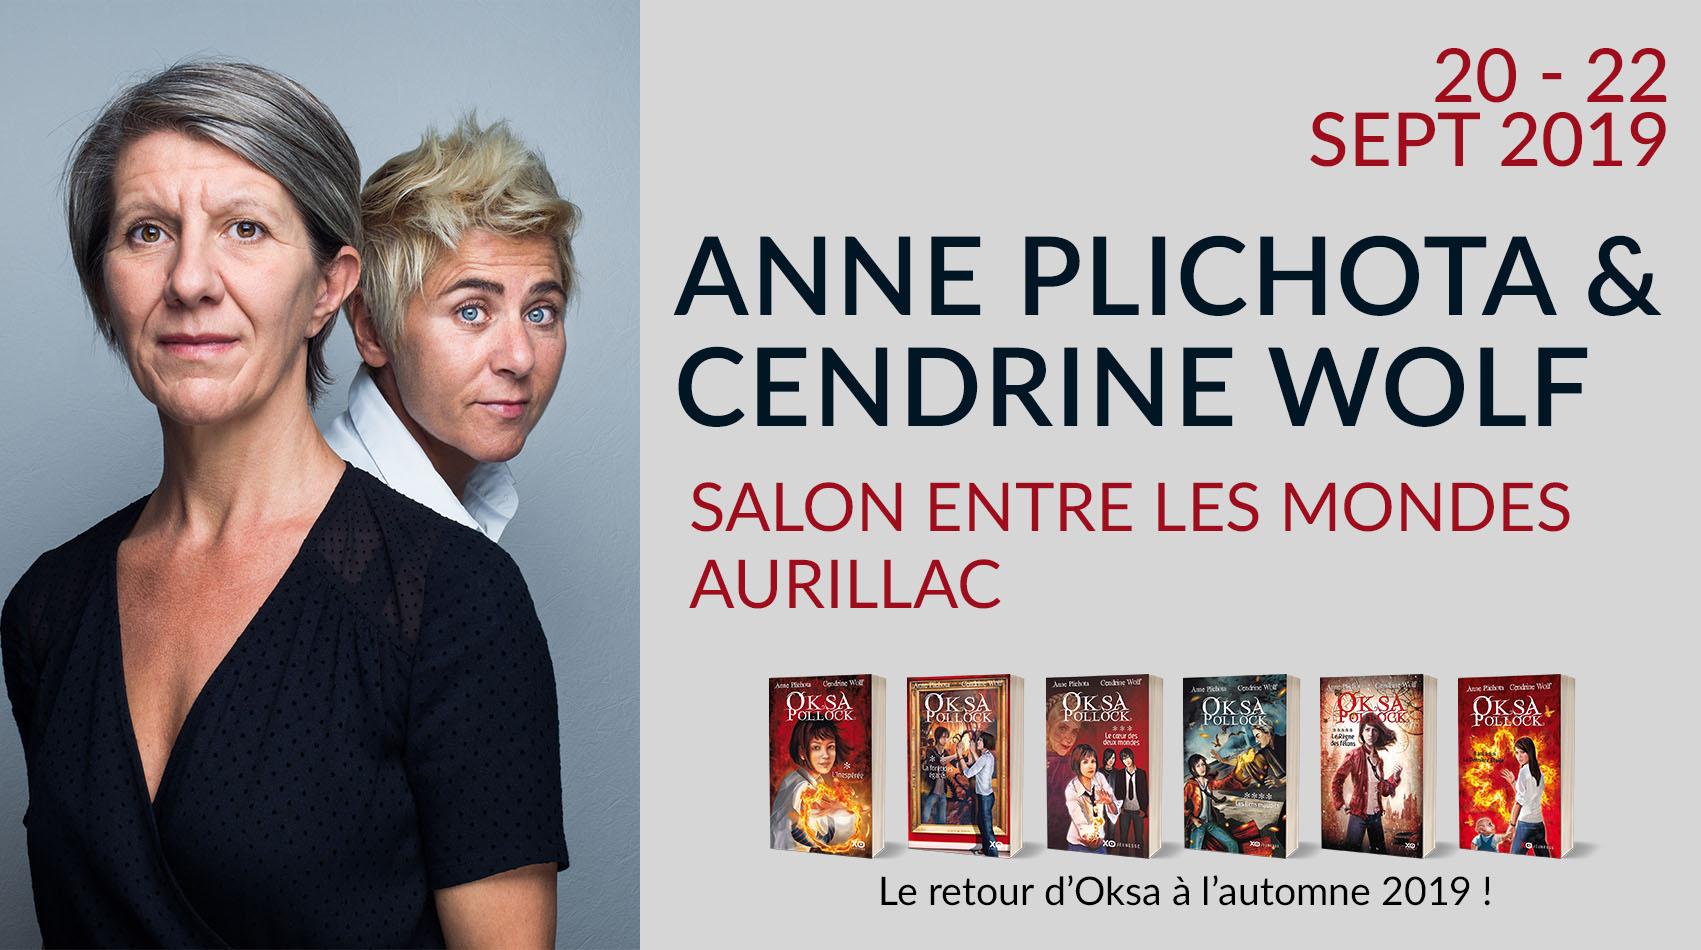 ANNE PLICHOTA & CENDRINE WOLF À AURILLAC